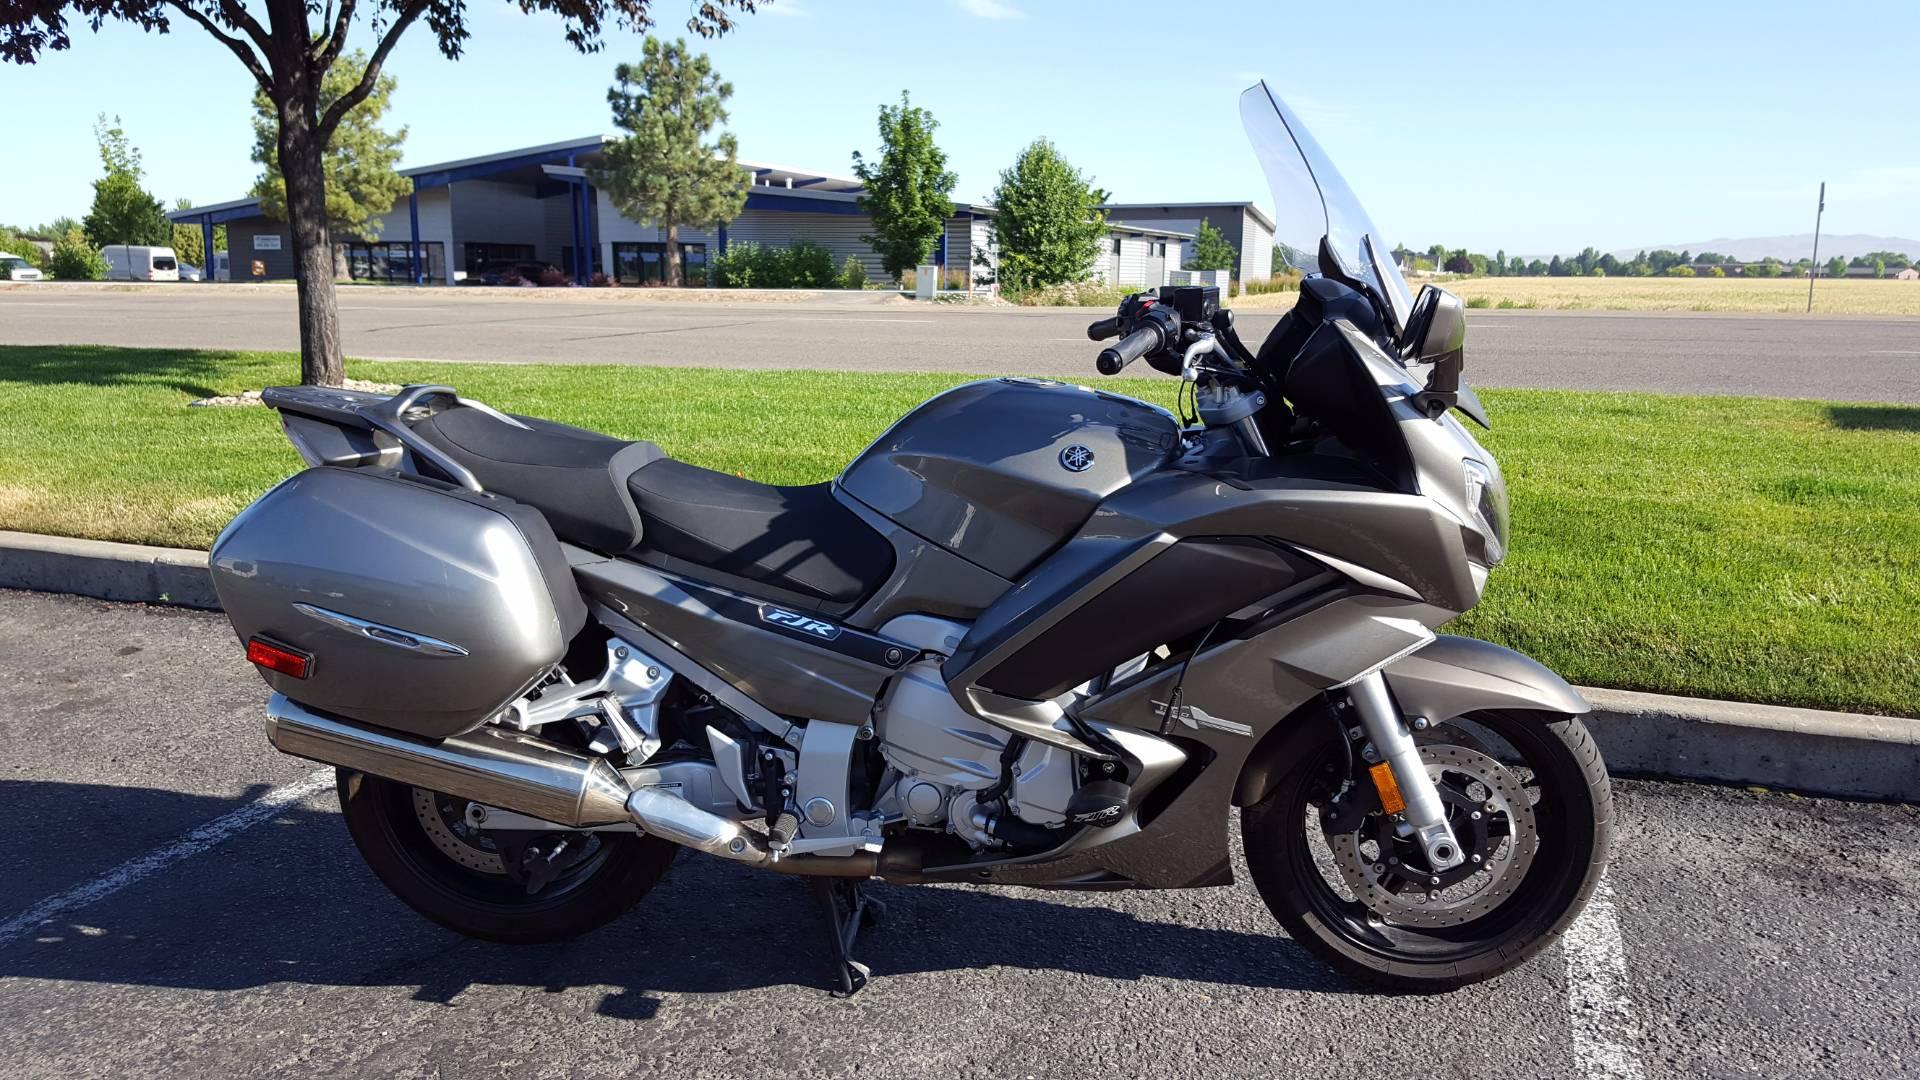 2013 Yamaha FJR1300A 2